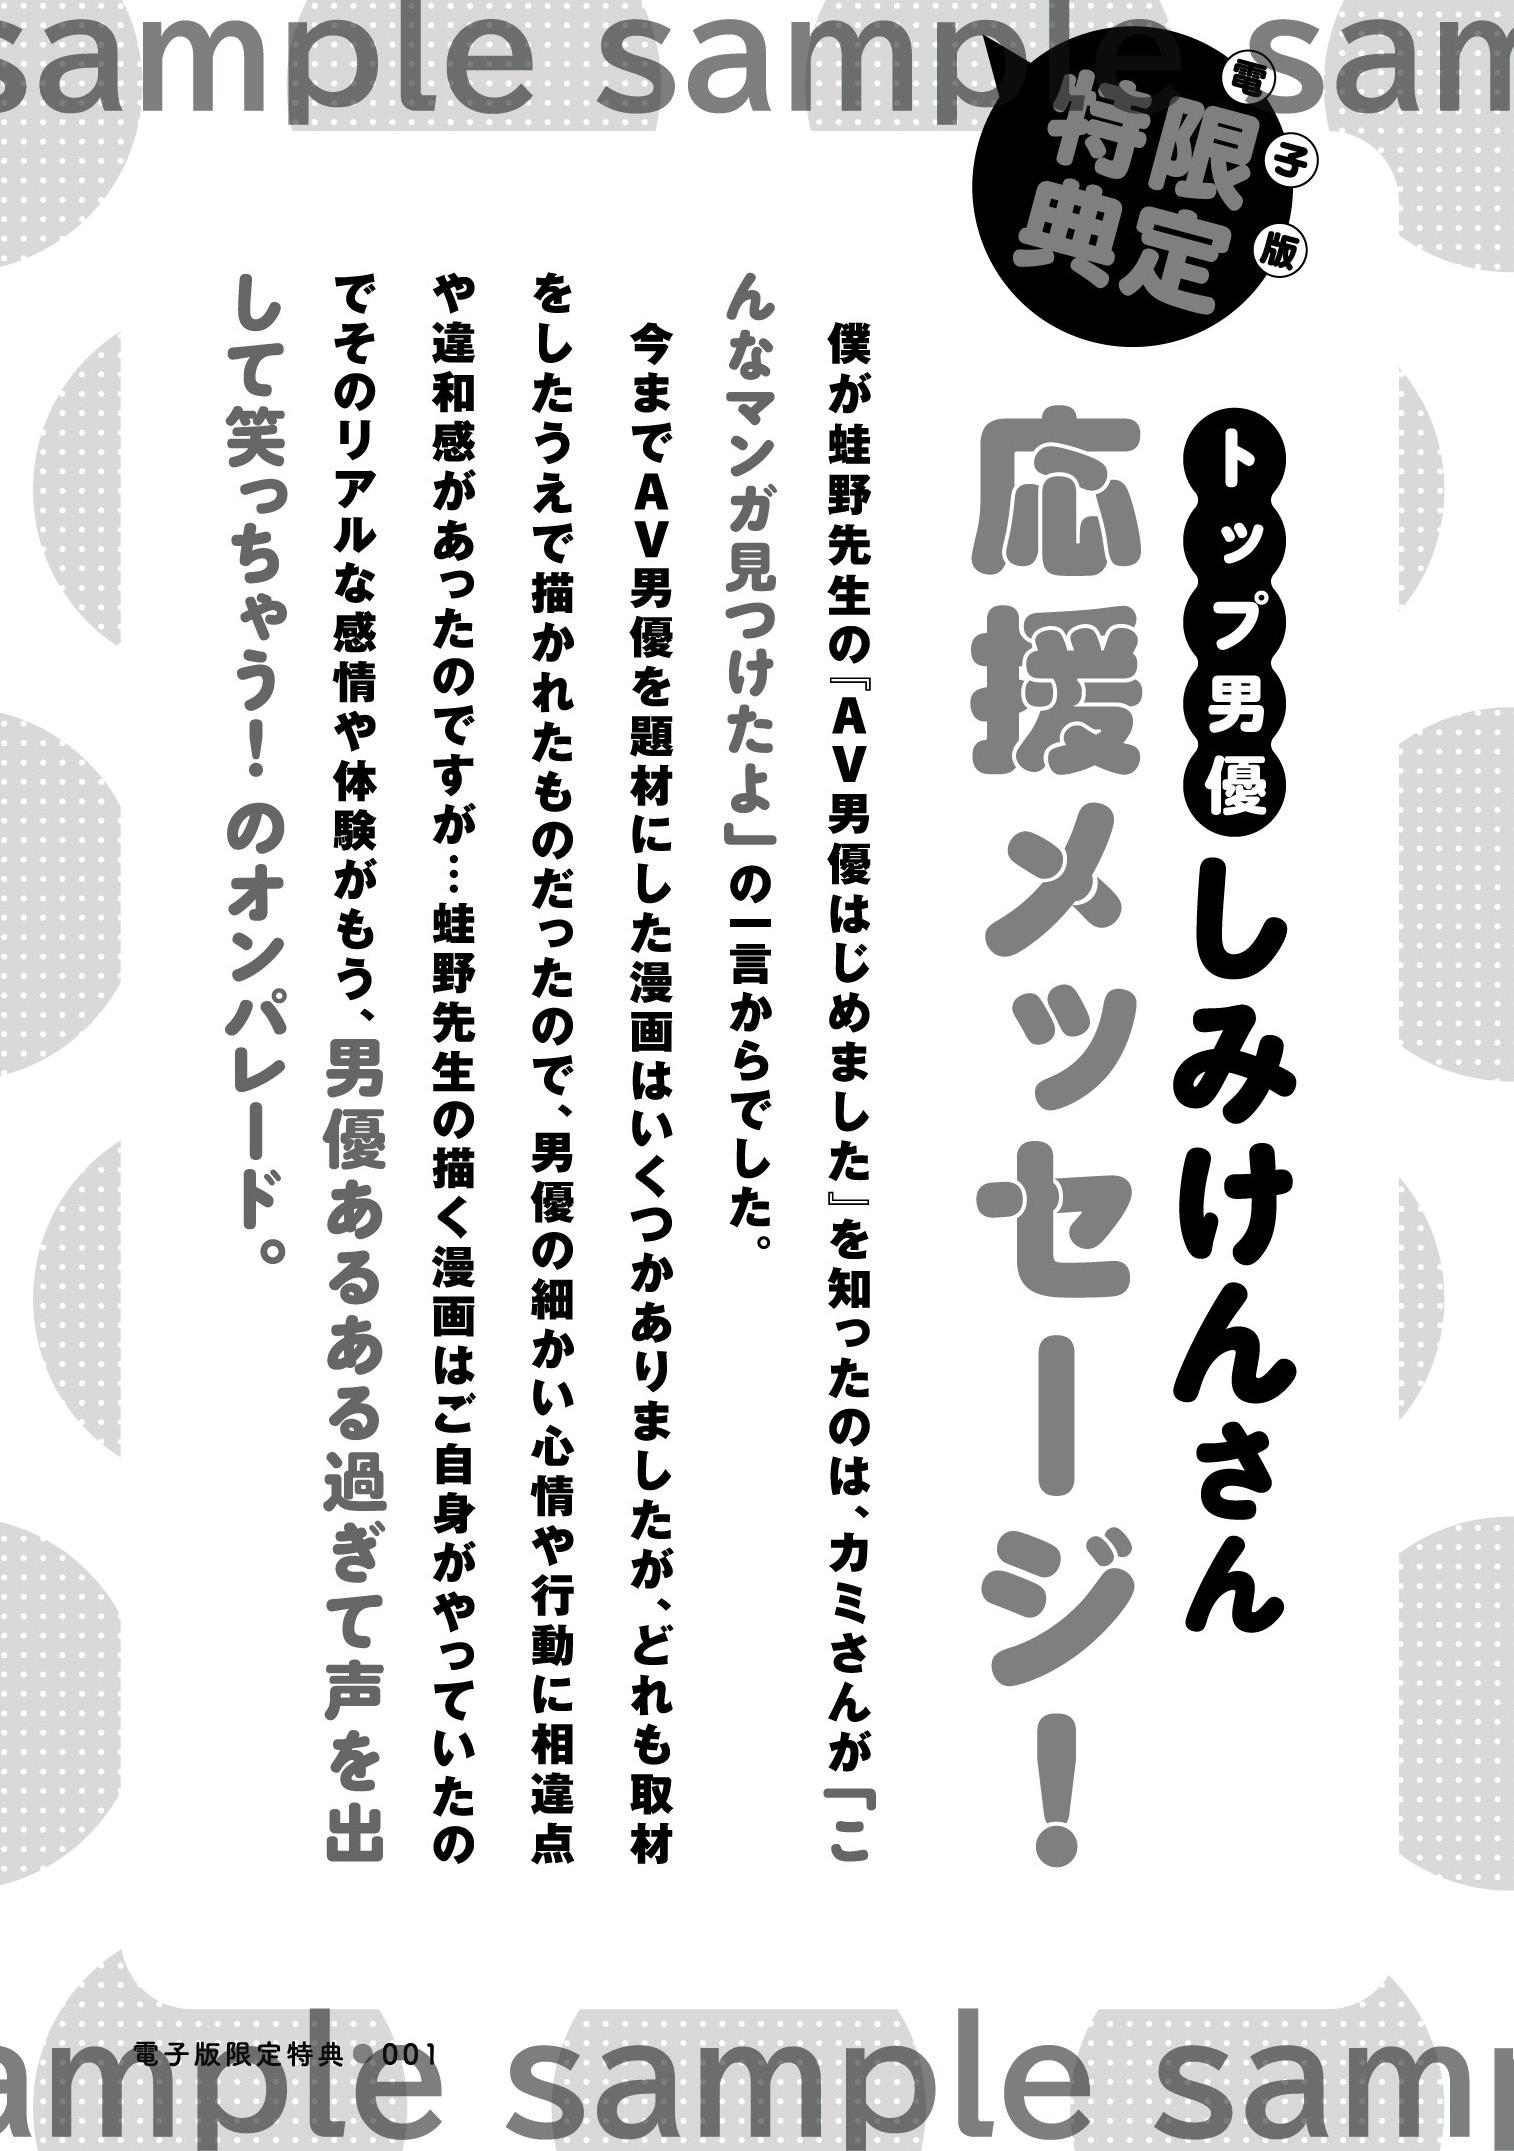 f:id:kuragebunch:20210207232124j:plain